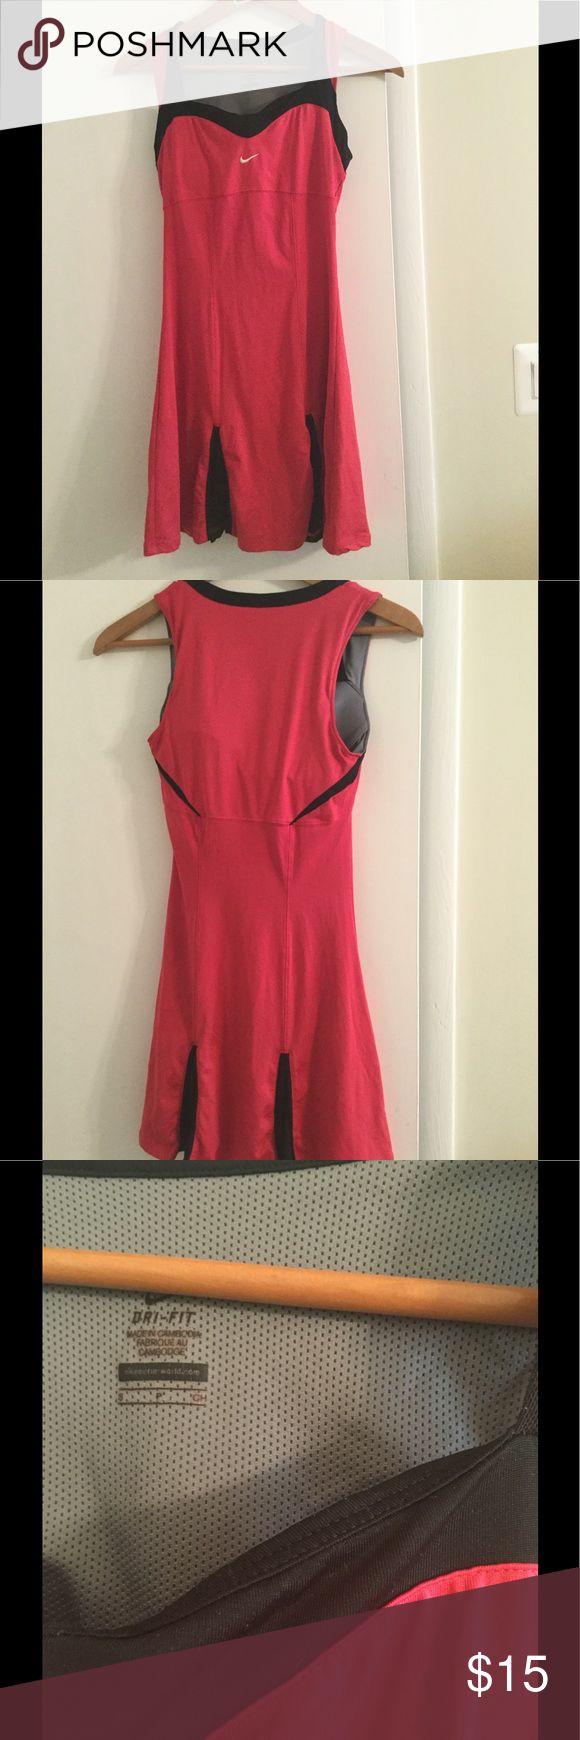 NIKE tennis dress size S Nike Tennis dress in good condition Nike Dresses